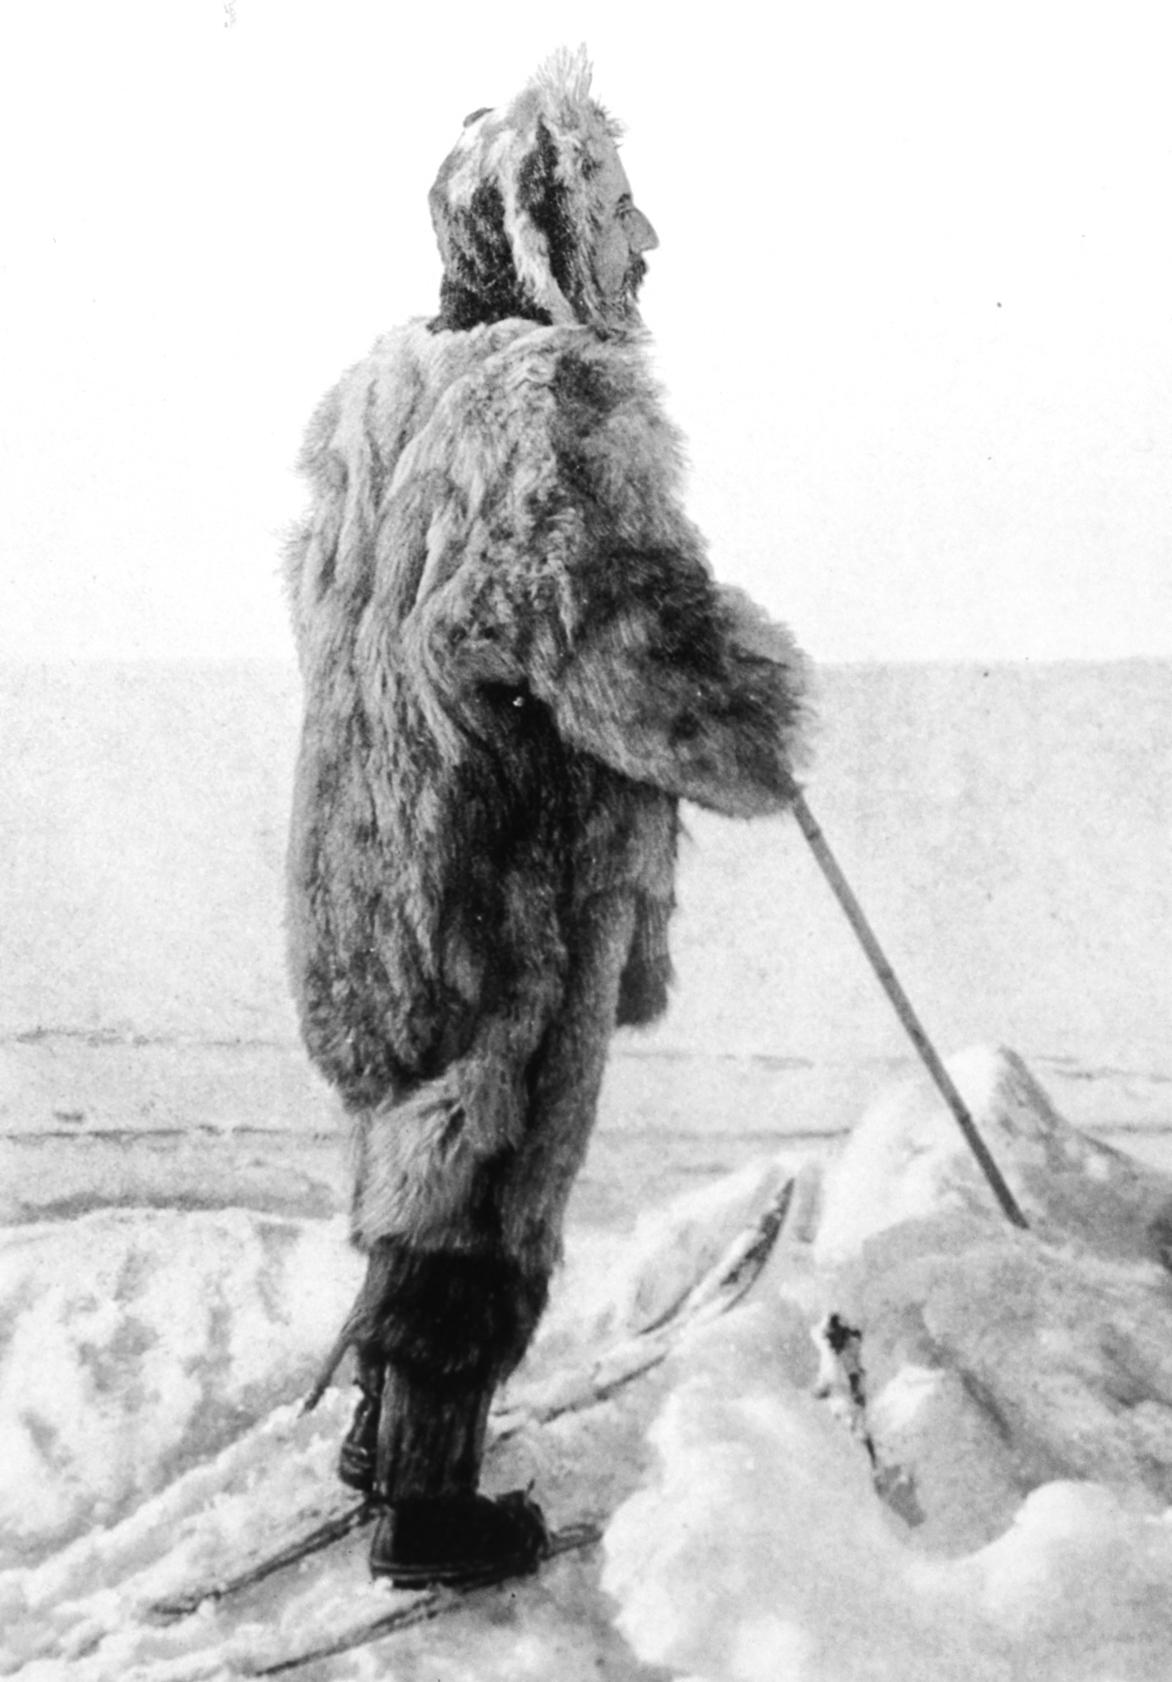 Roald Amundsen in Antarctica